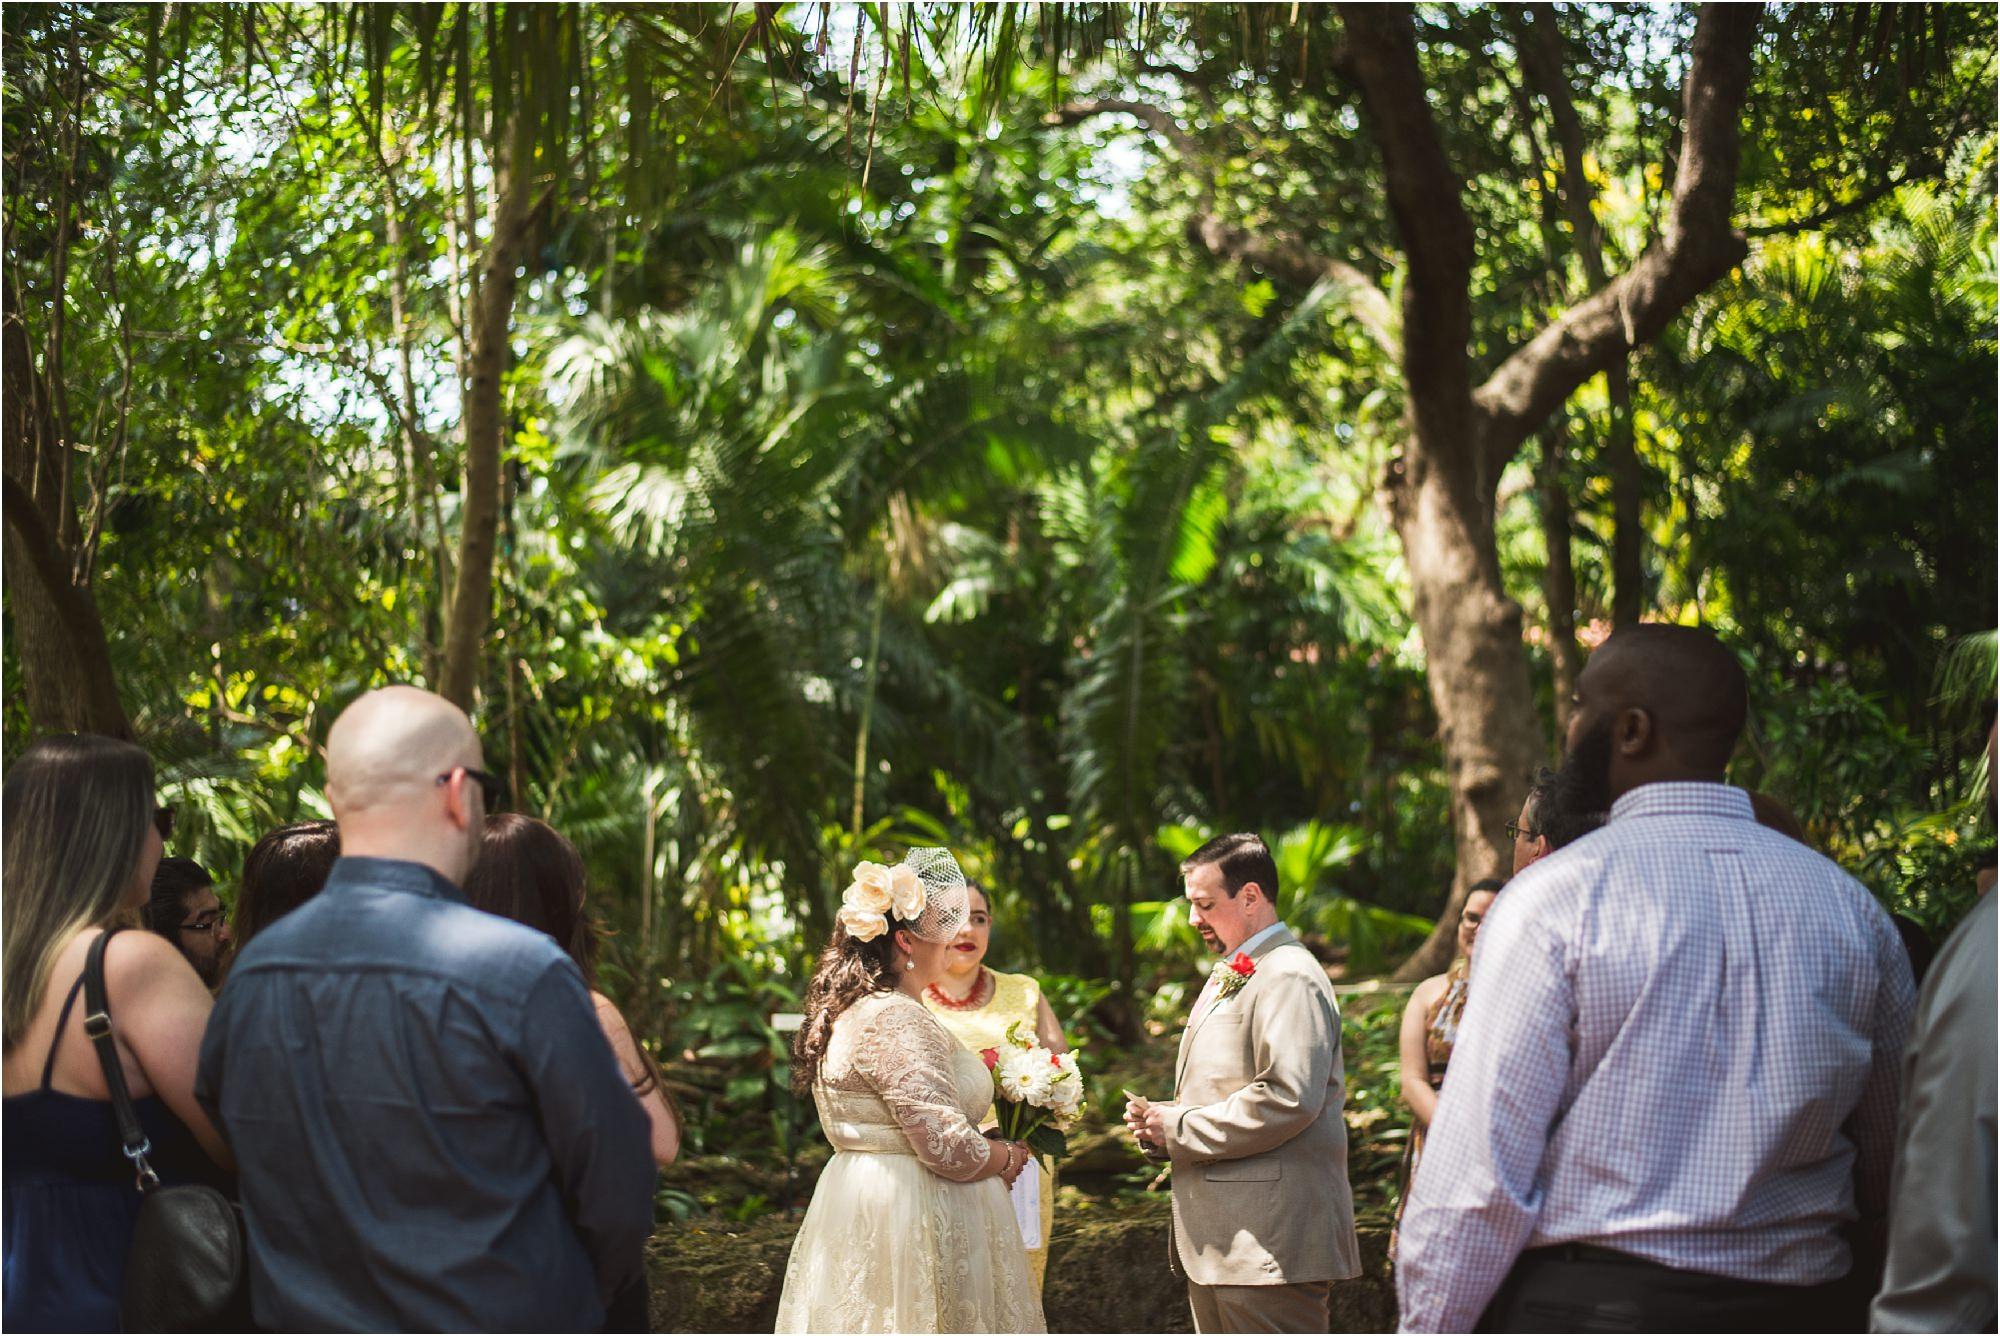 outdoor-rustic-pincrest-gardens-wedding-miami-photographer-jessenia-gonzalez_1035.jpg